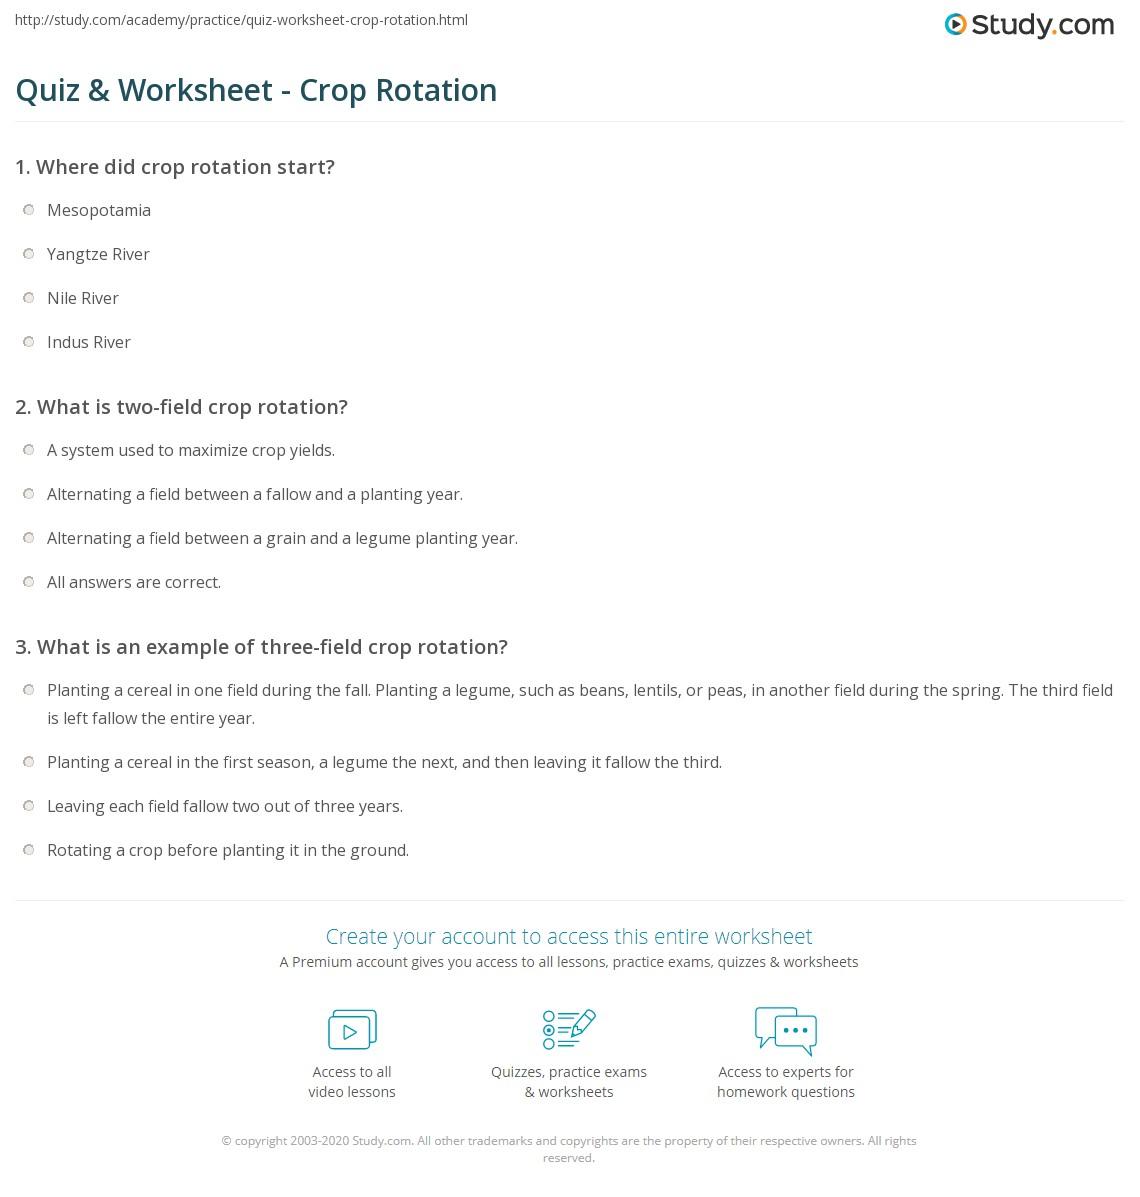 Quiz & Worksheet - Crop Rotation | Study.com